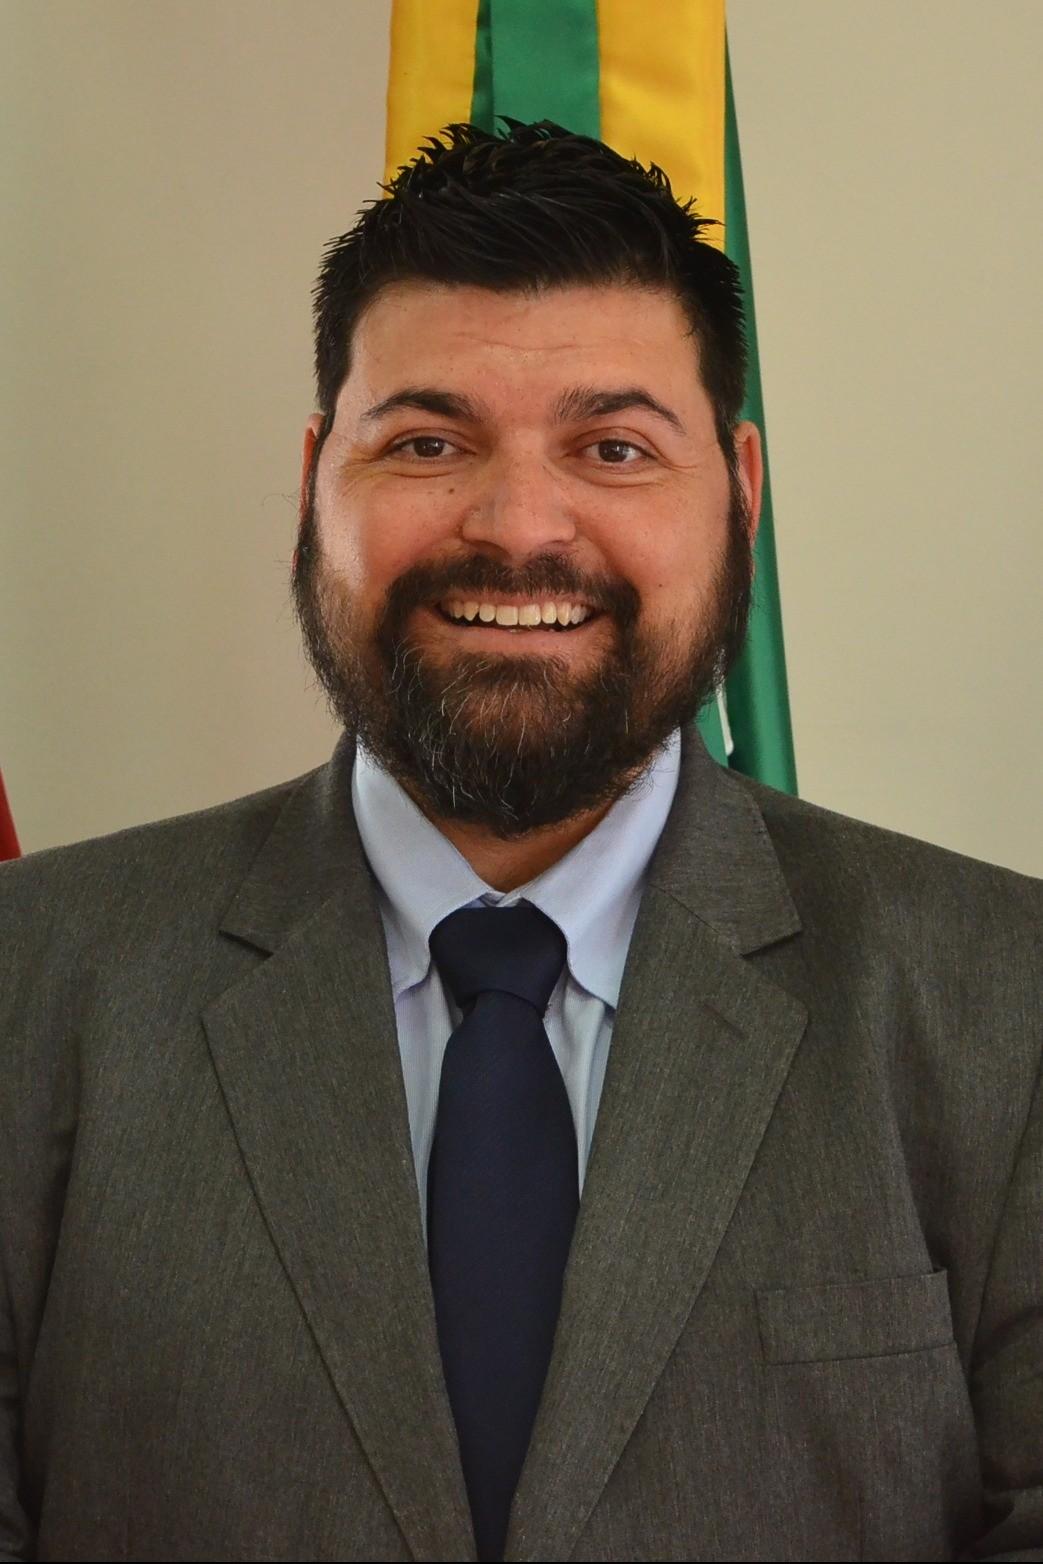 Foto de perfil - Lucas da Costa de Lima